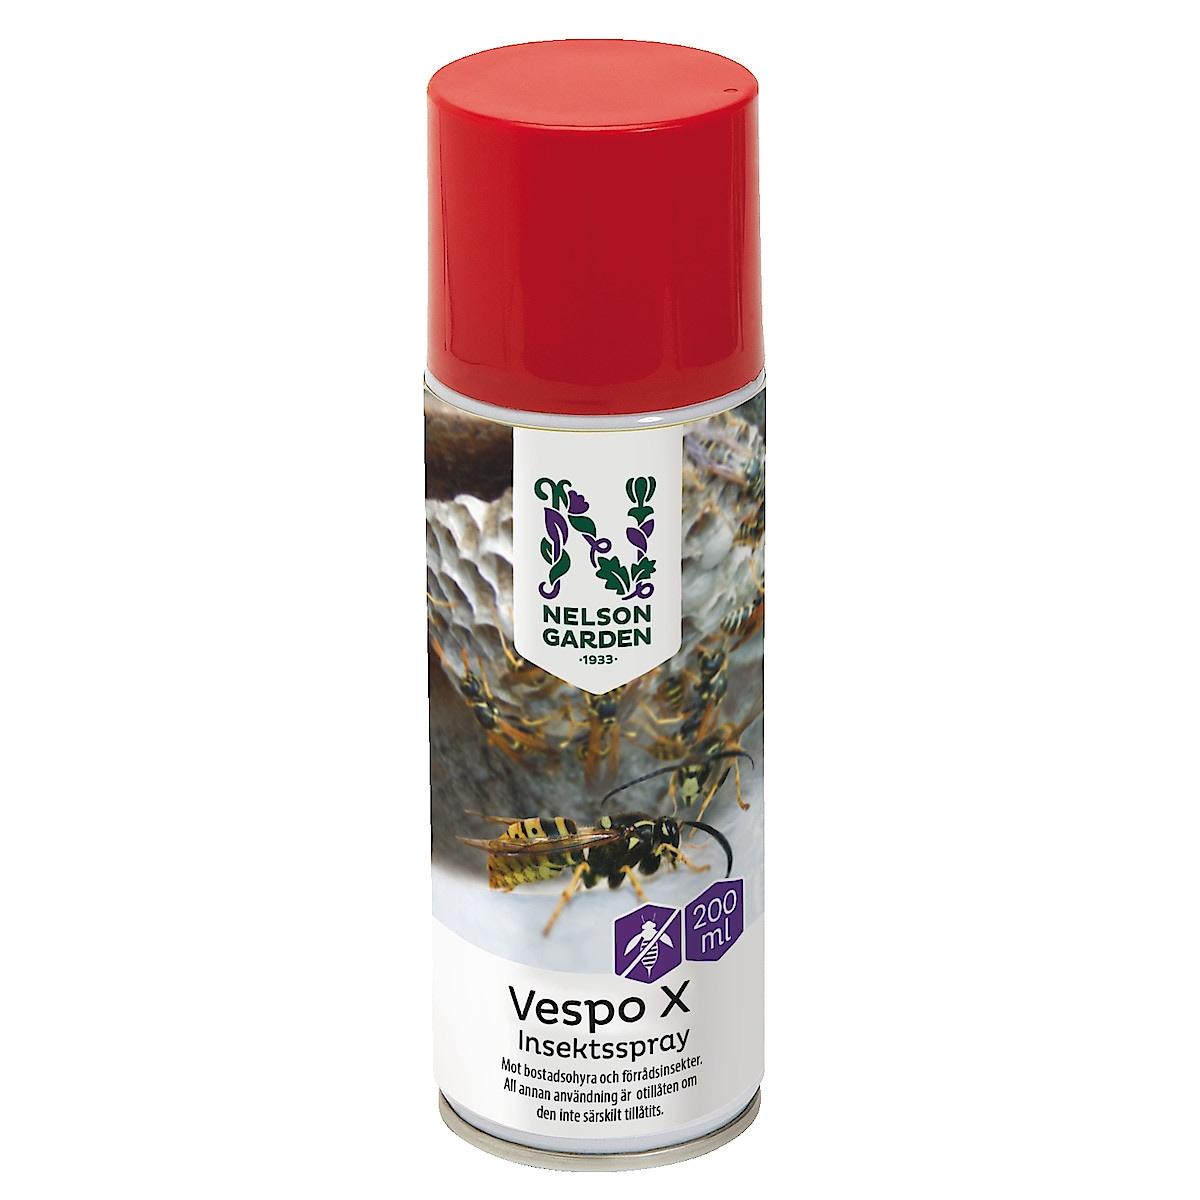 Insektsspray Vespo X, Nelson Garden